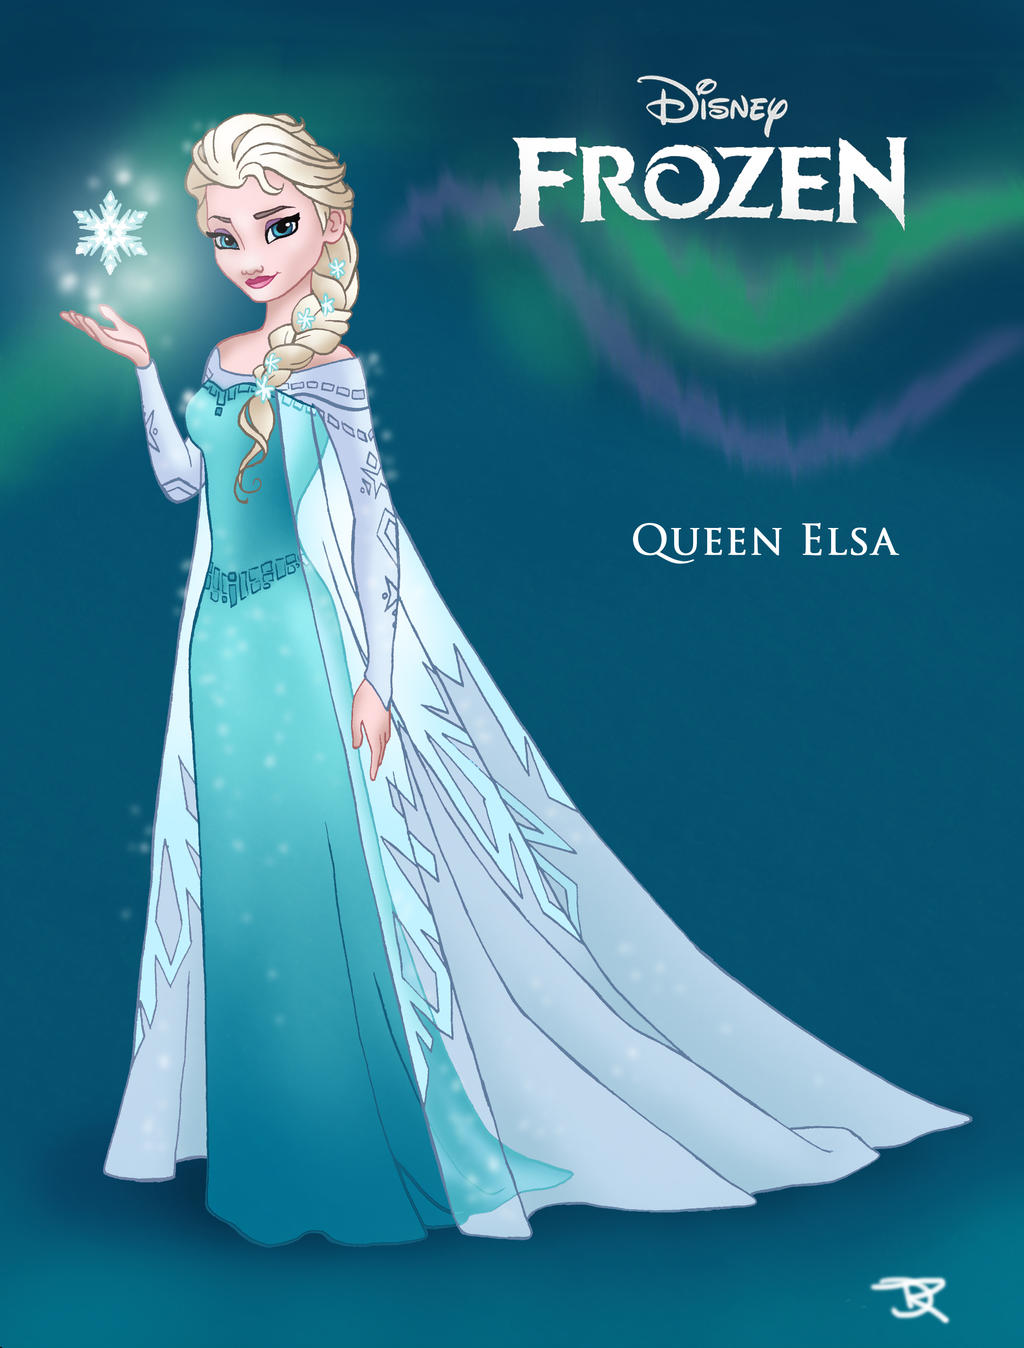 Queen Elsa Coloring Page Queen elsa by dvythmsky